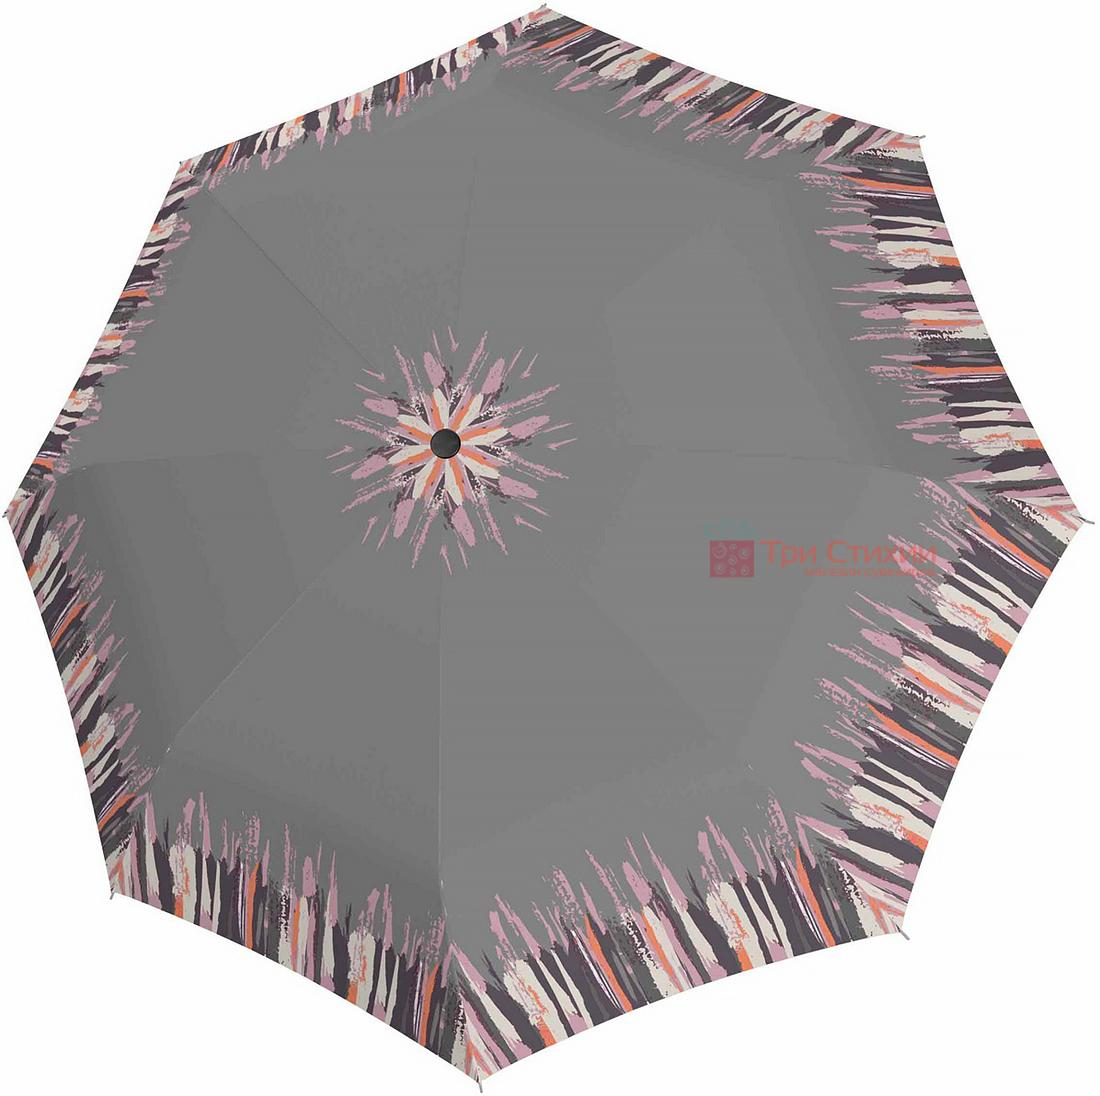 Зонт складной Doppler 7301652902-2 полуавтомат Серый, фото